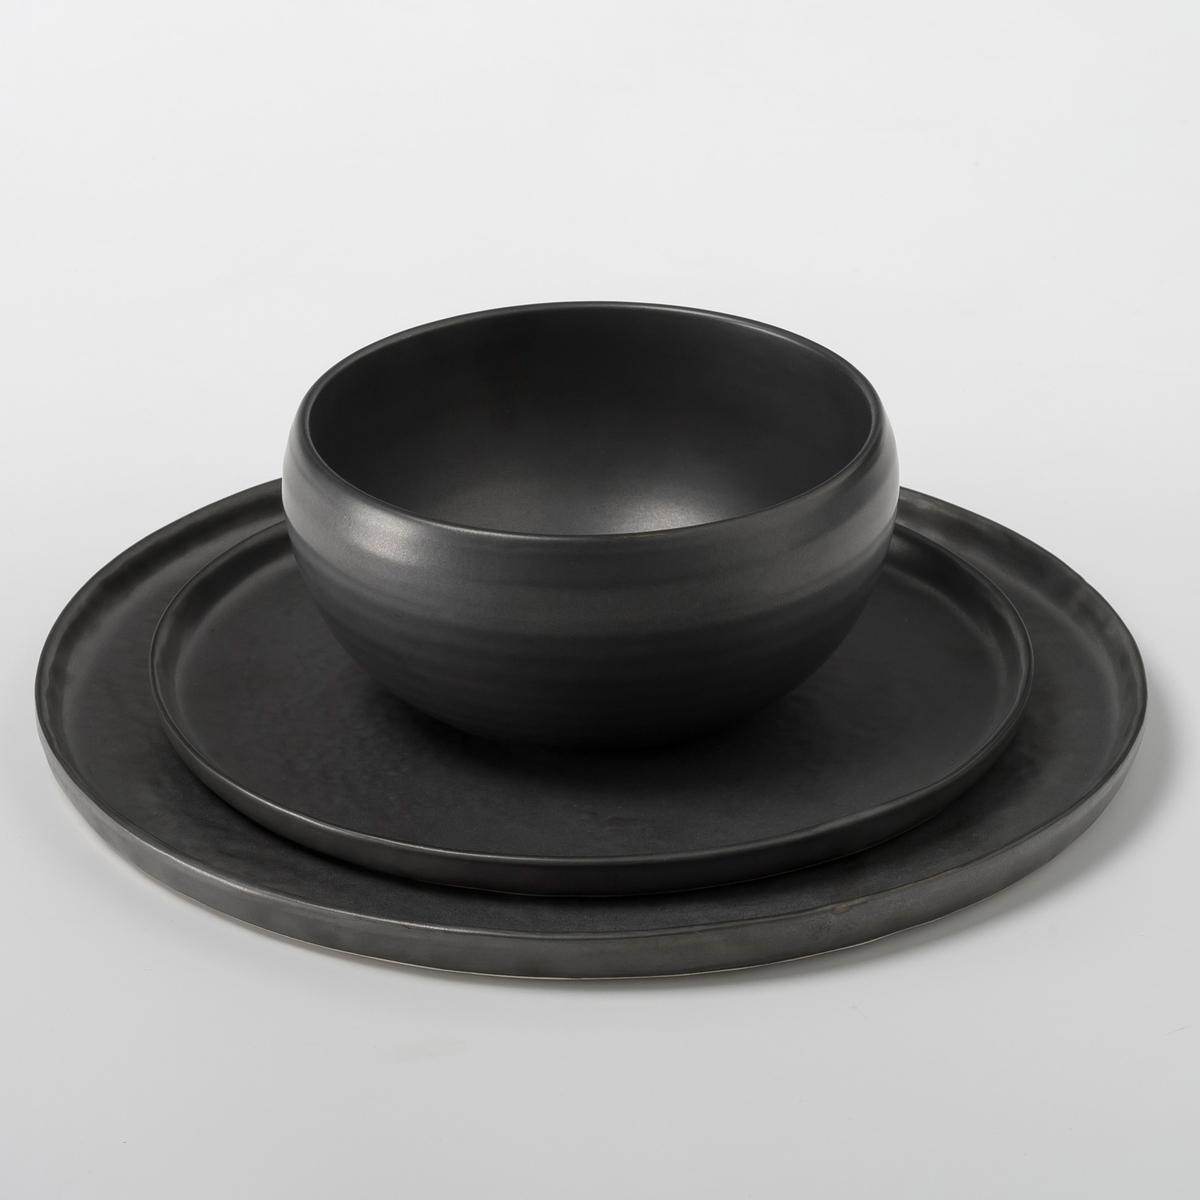 Тарелка десертная из керамики Pure P.Naessens для Serax от La Redoute